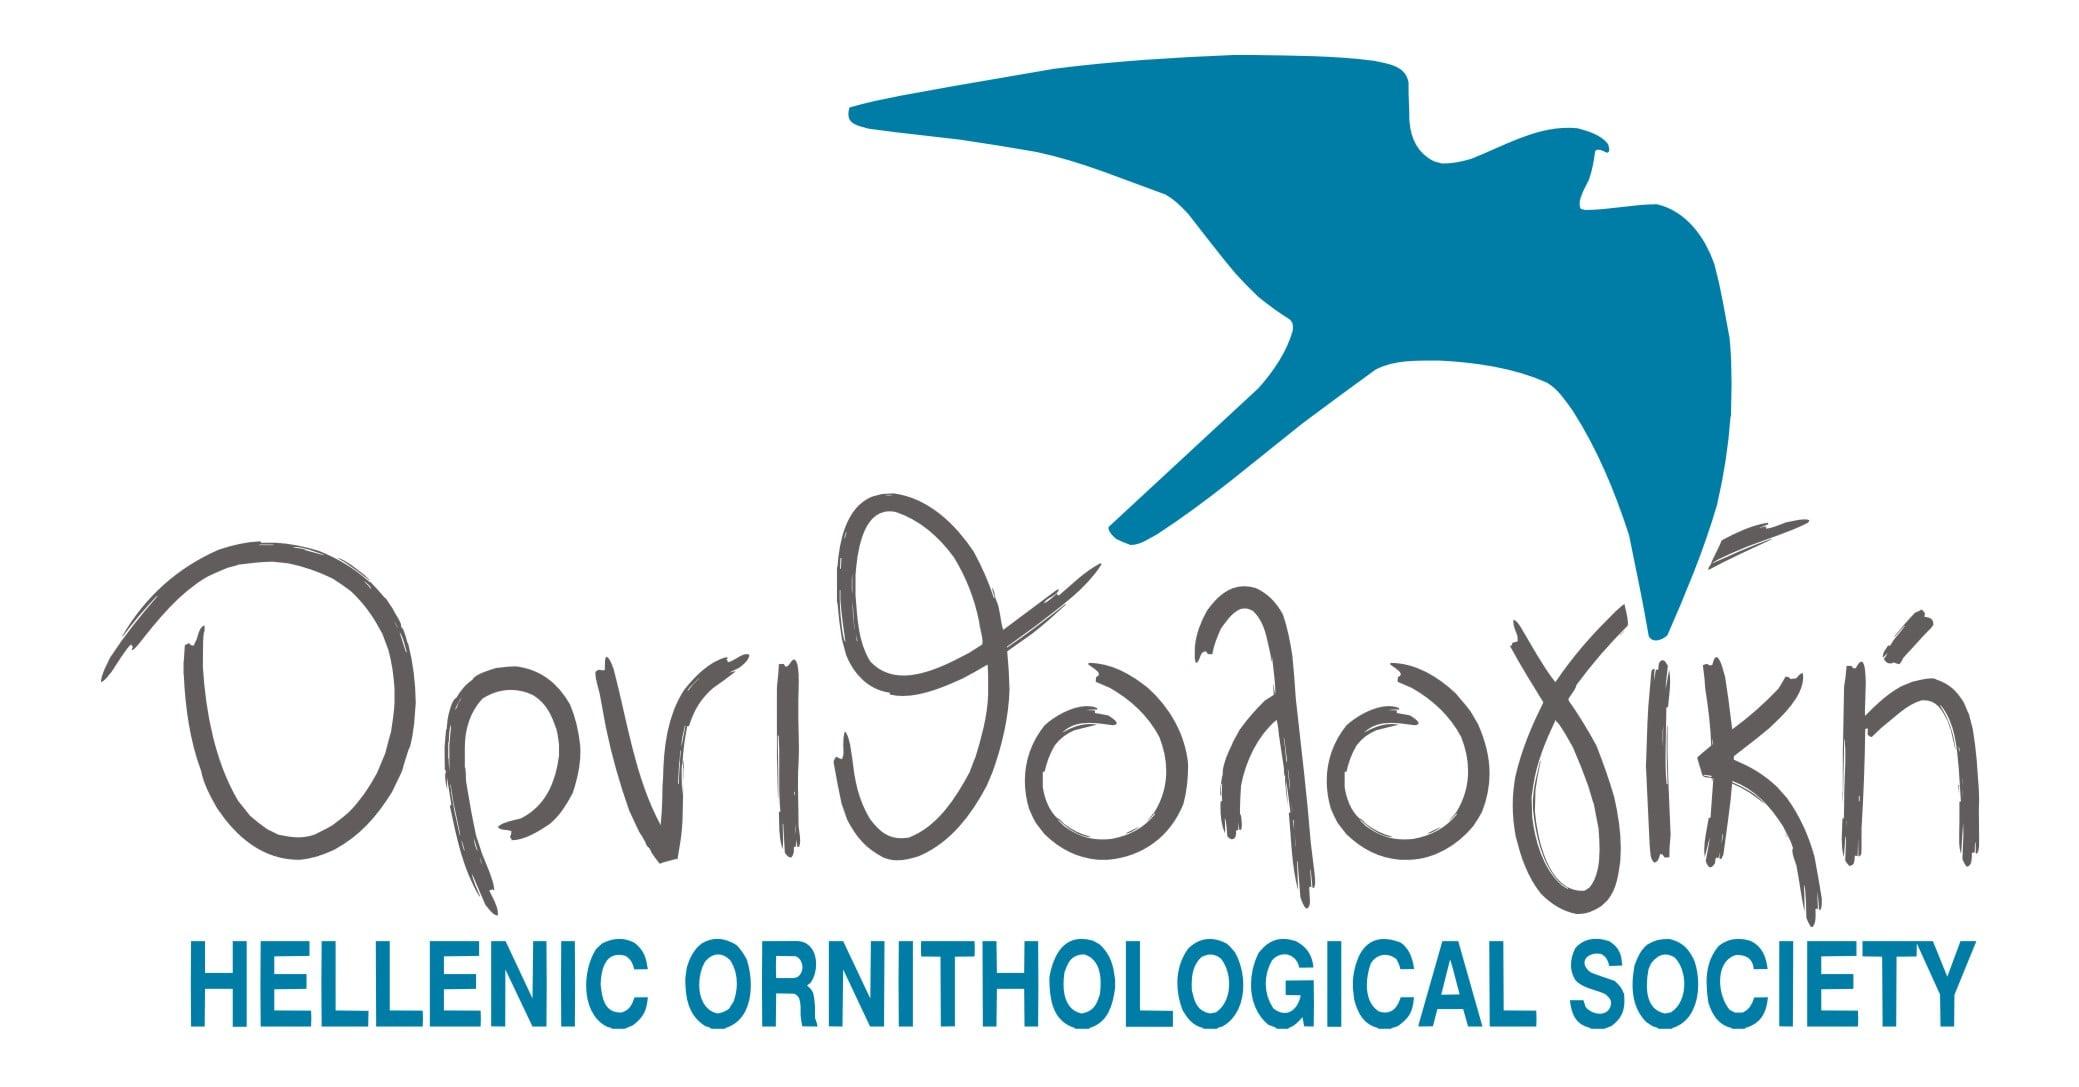 Hellenic Ornithological Society   Mandra System of Lemnos, Greece